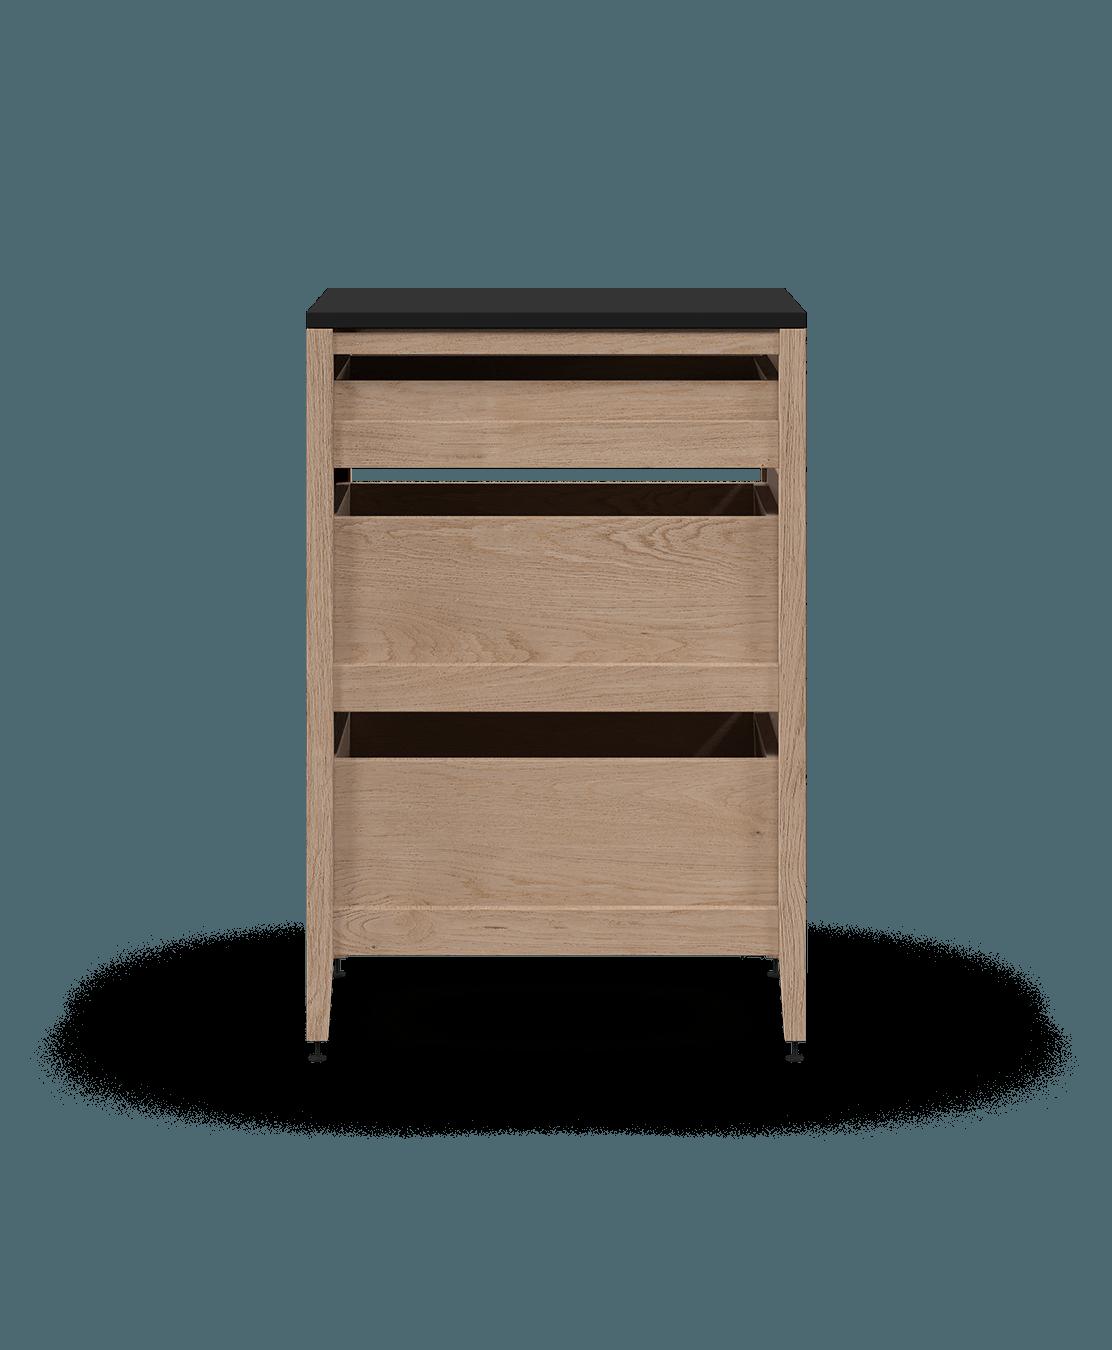 coquo radix white oak solid wood modular 3 drawers base kitchen cabinet 18 inch C1-C-18TB-3002-NA